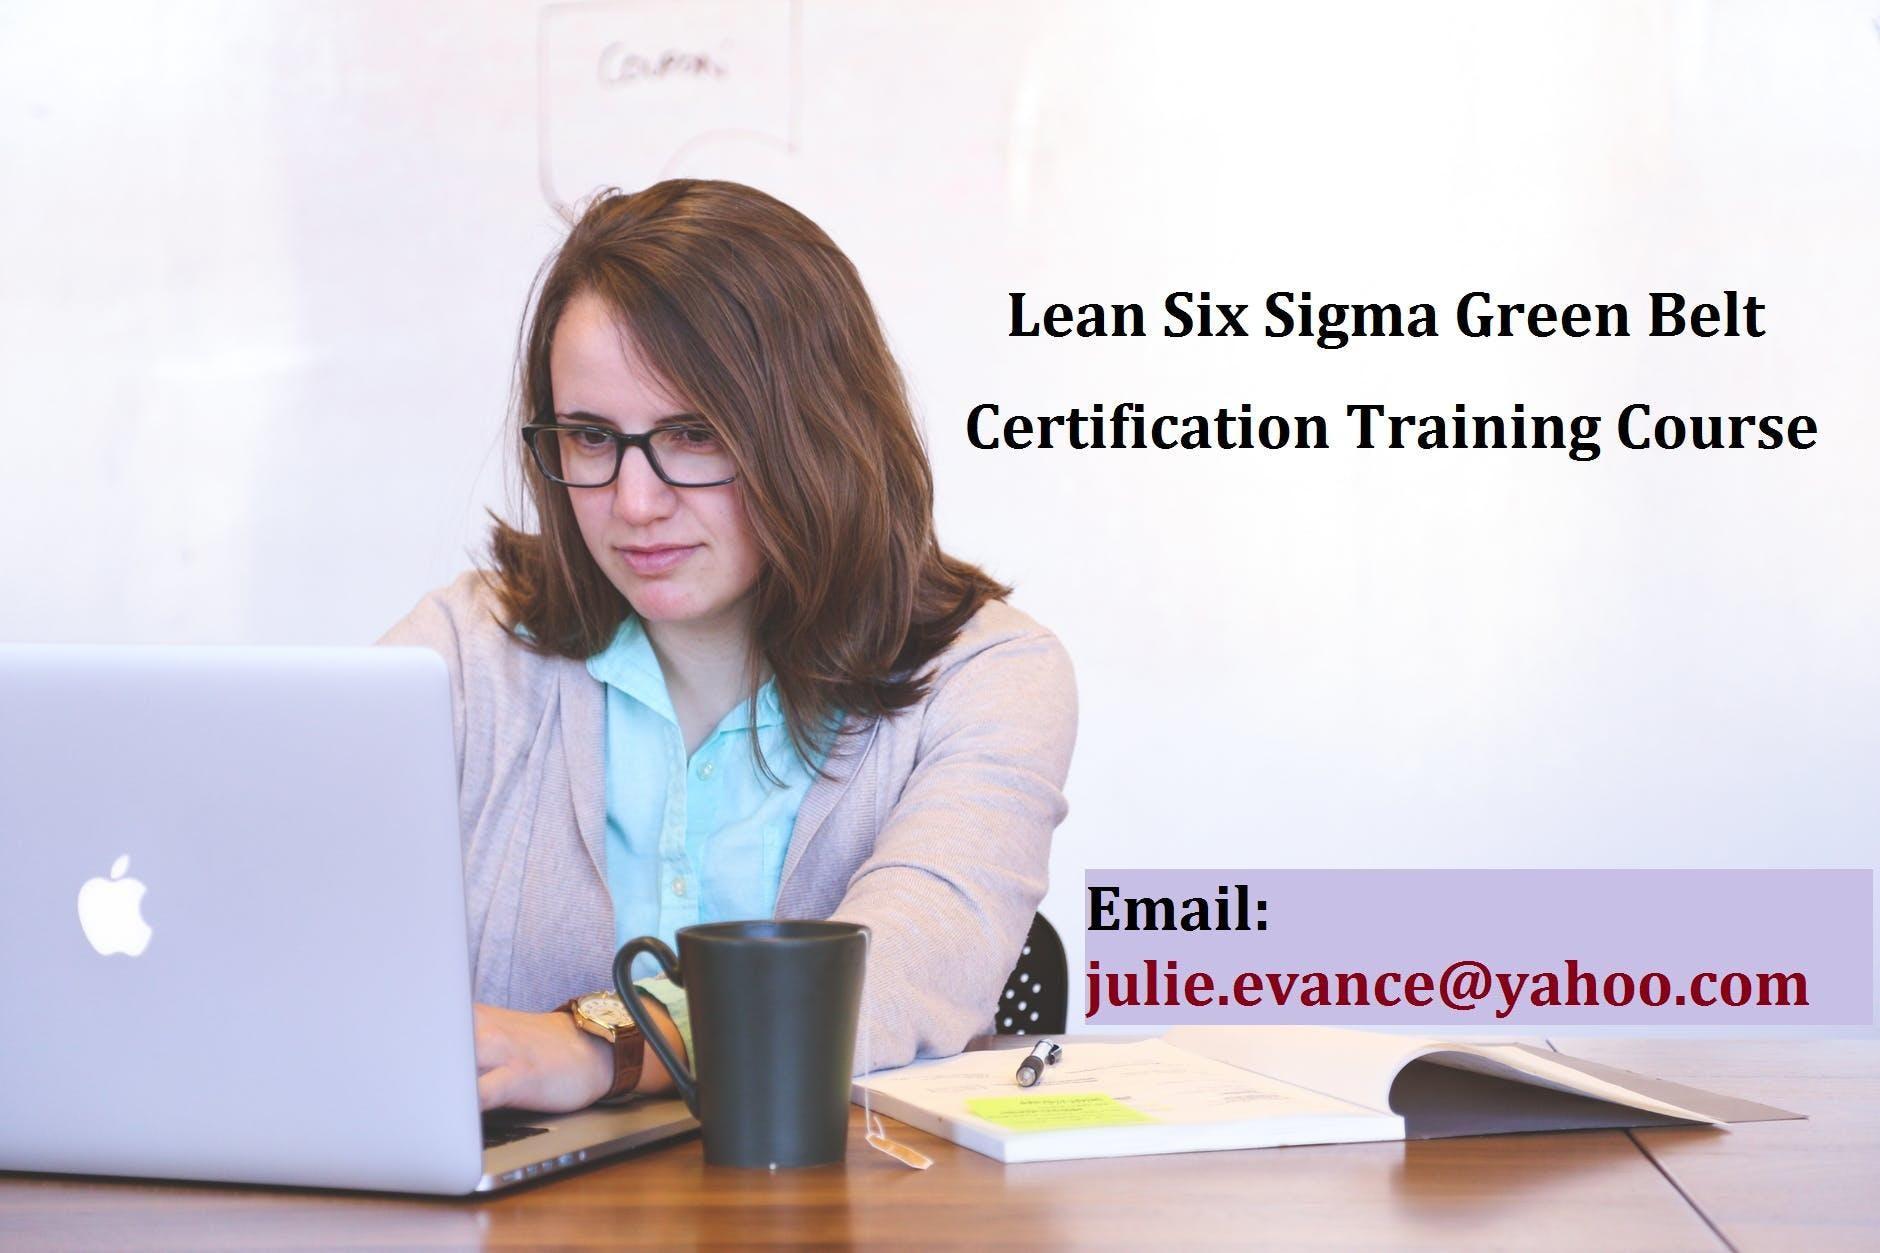 Lean Six Sigma Green Belt (LSSGB) Certification Course in Arcata, CA